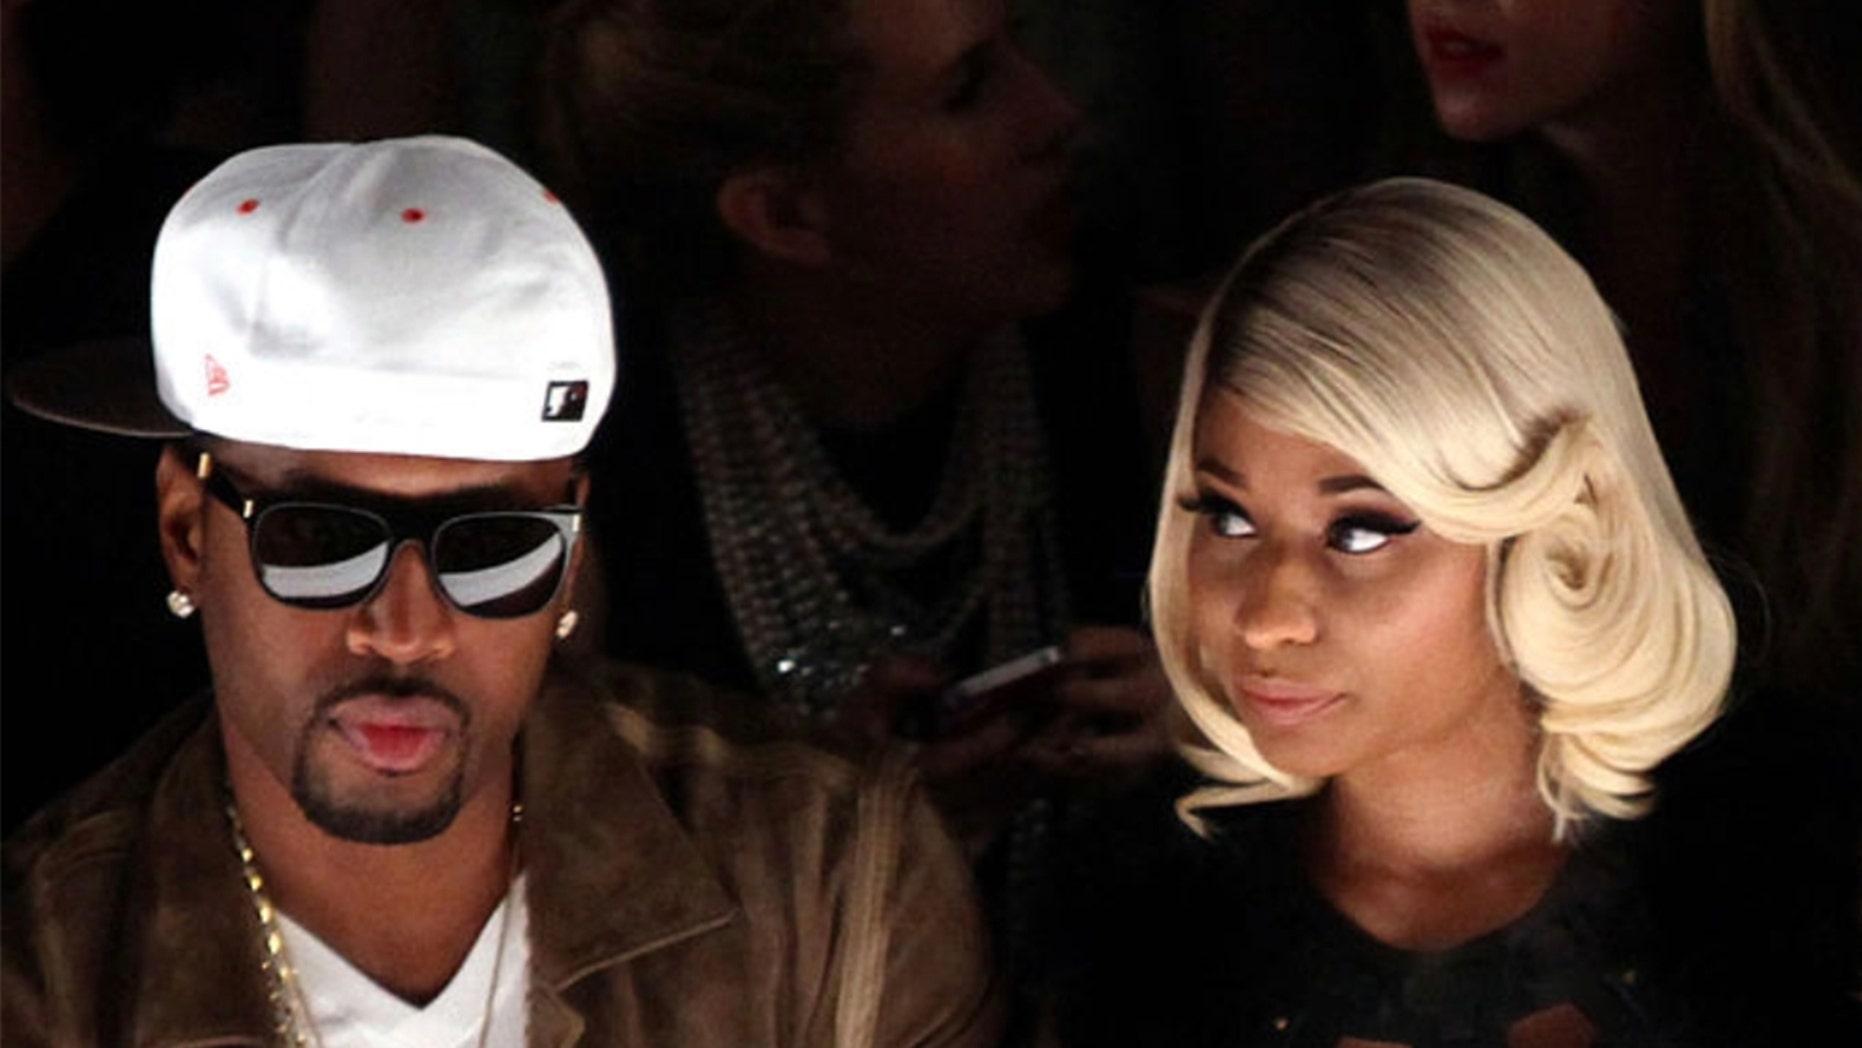 Nicki Minajs new boyfriend Kenneth Zoo Petty has the rappers name tattooed on his neck